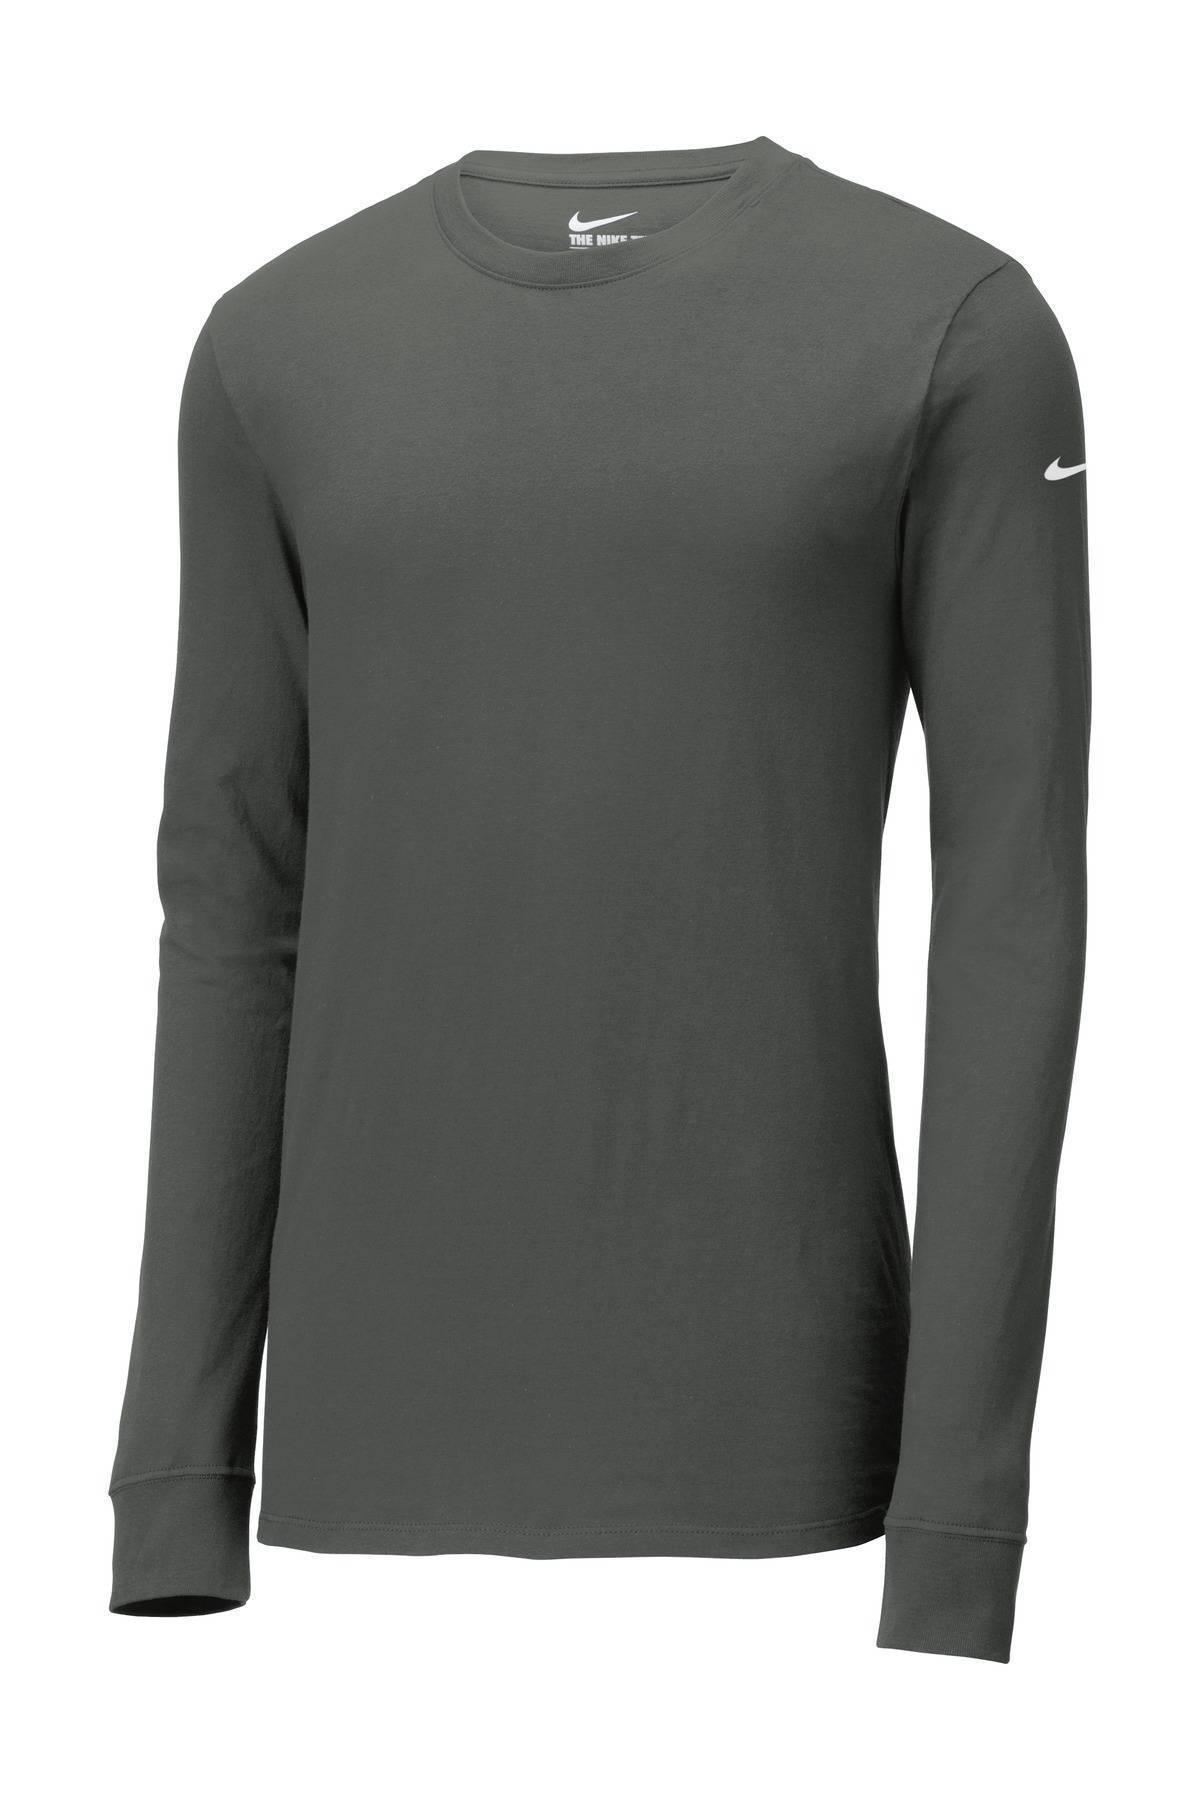 e05ca232 Custom Design Nike Dri Fit Shirts - DREAMWORKS